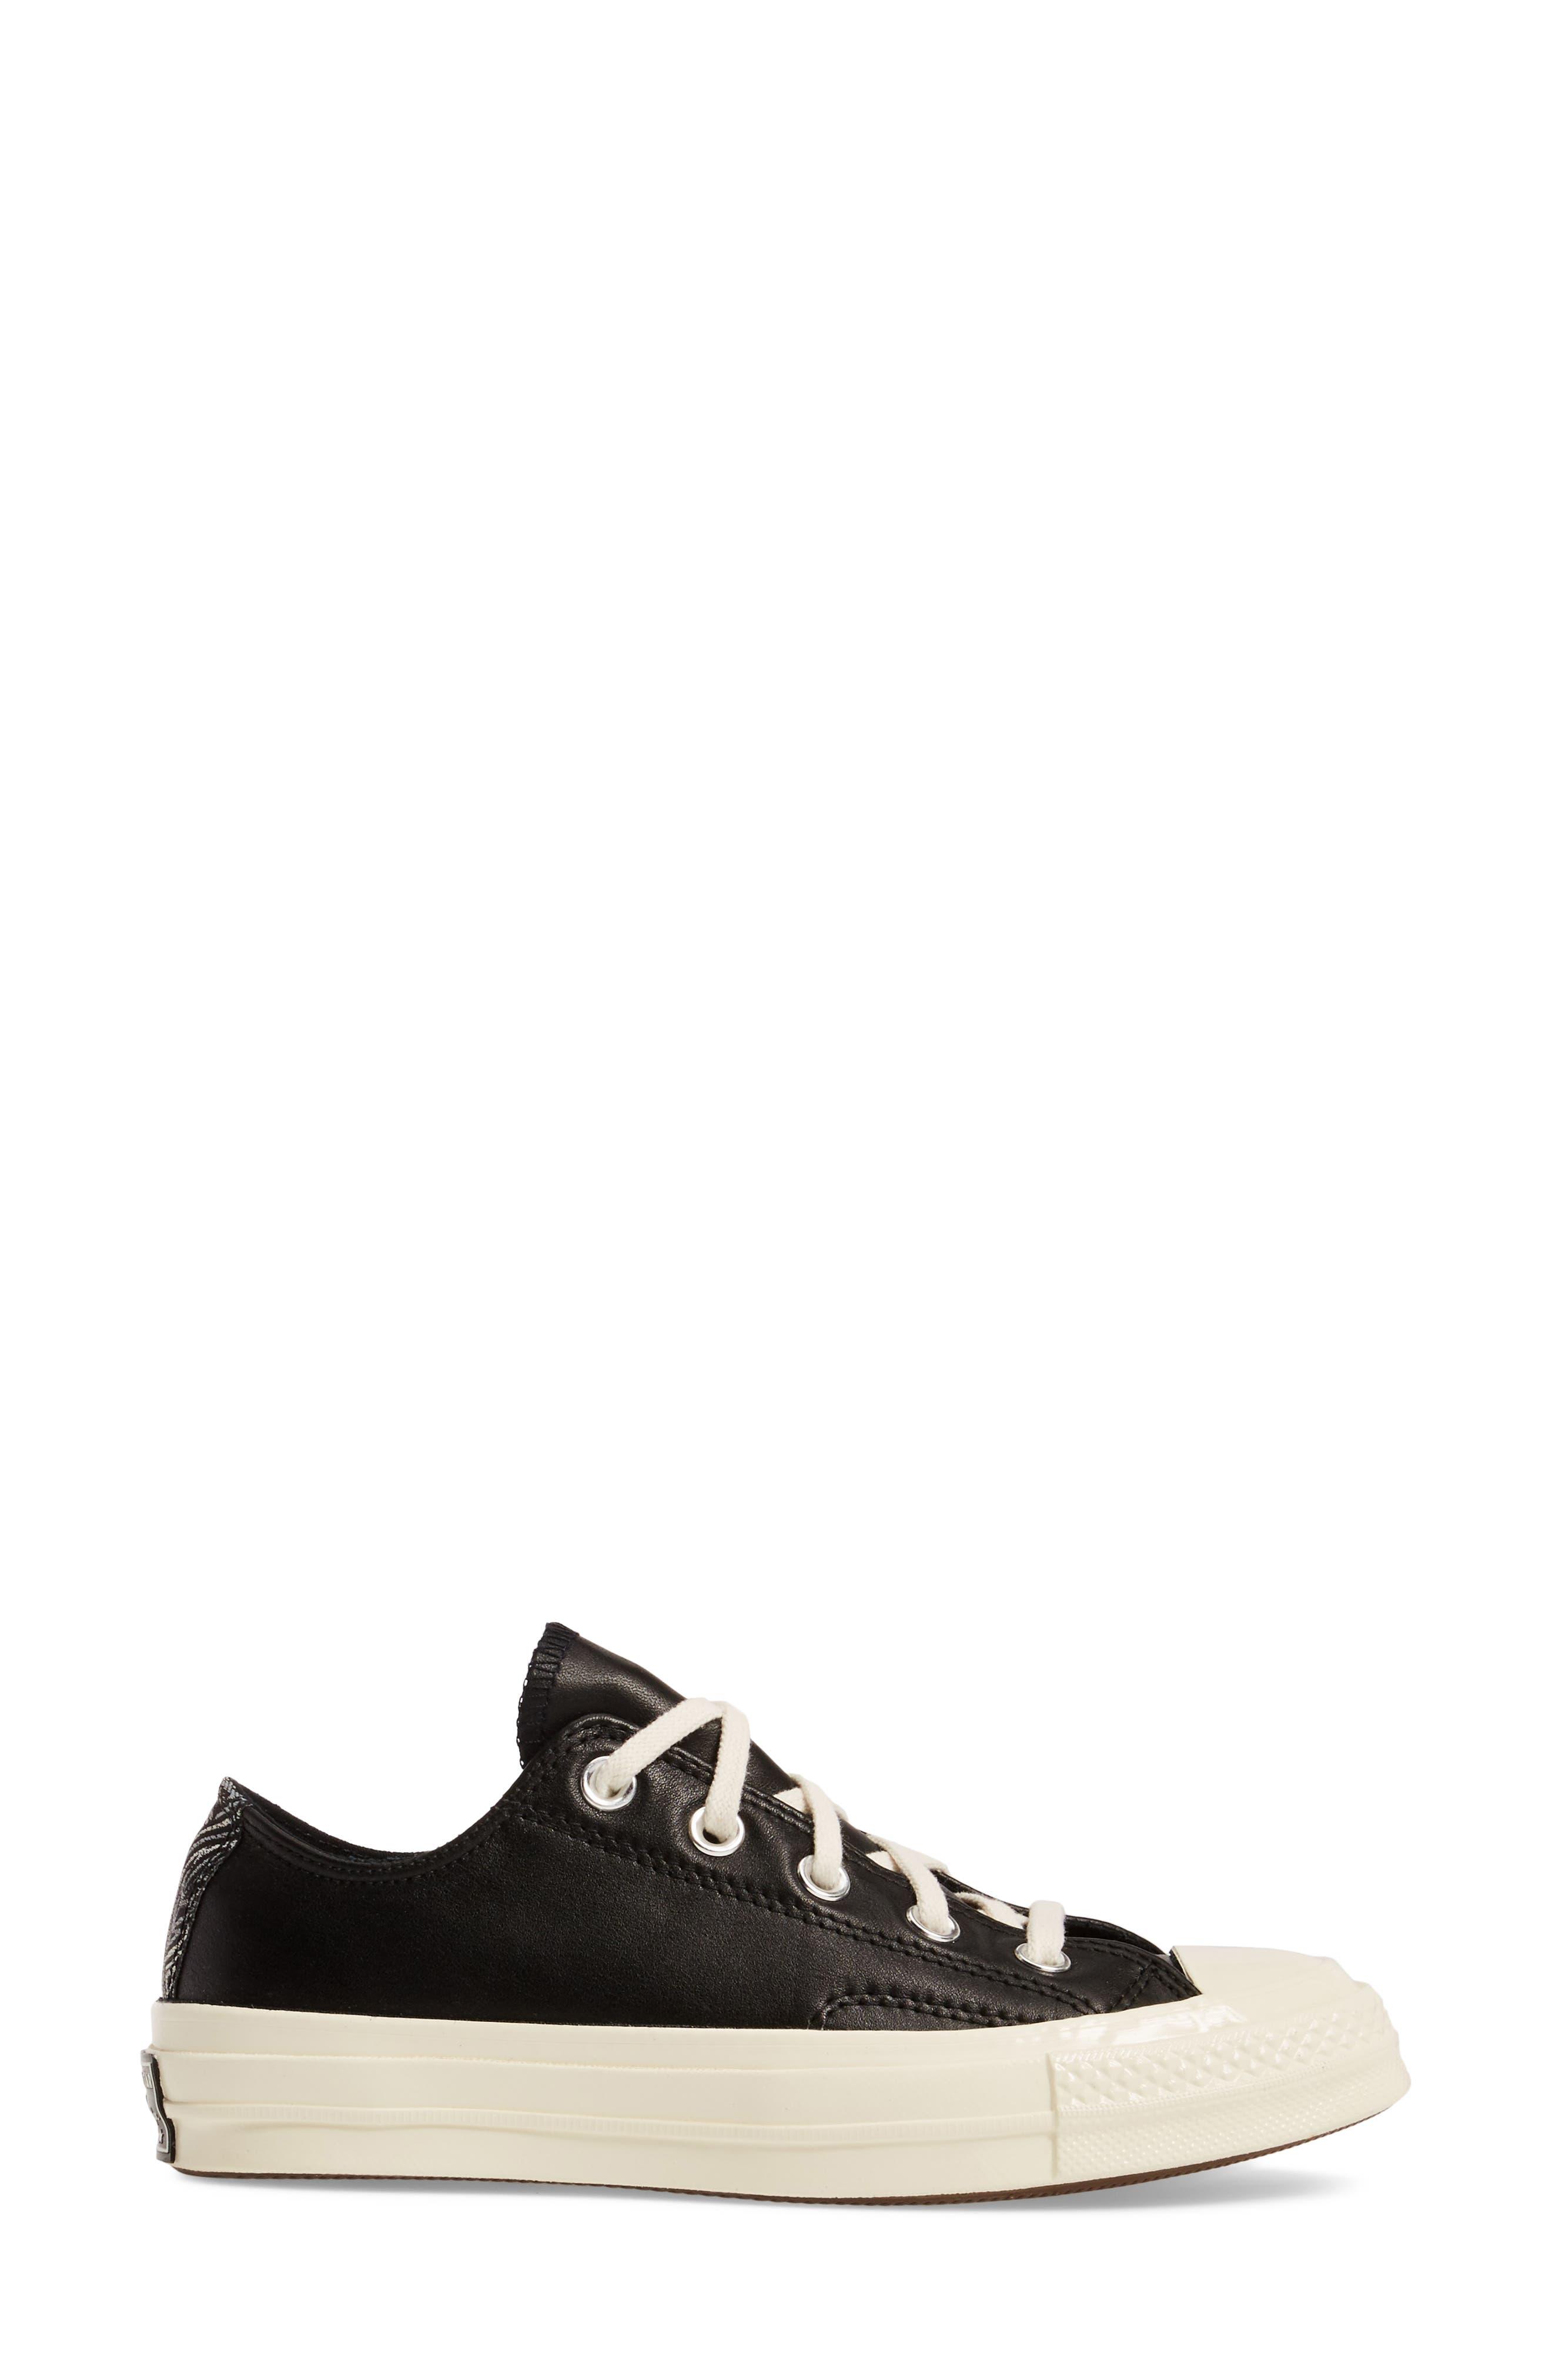 Chuck Taylor<sup>®</sup> All Star<sup>®</sup> Ox Genuine Calf Hair Sneaker,                             Alternate thumbnail 3, color,                             001